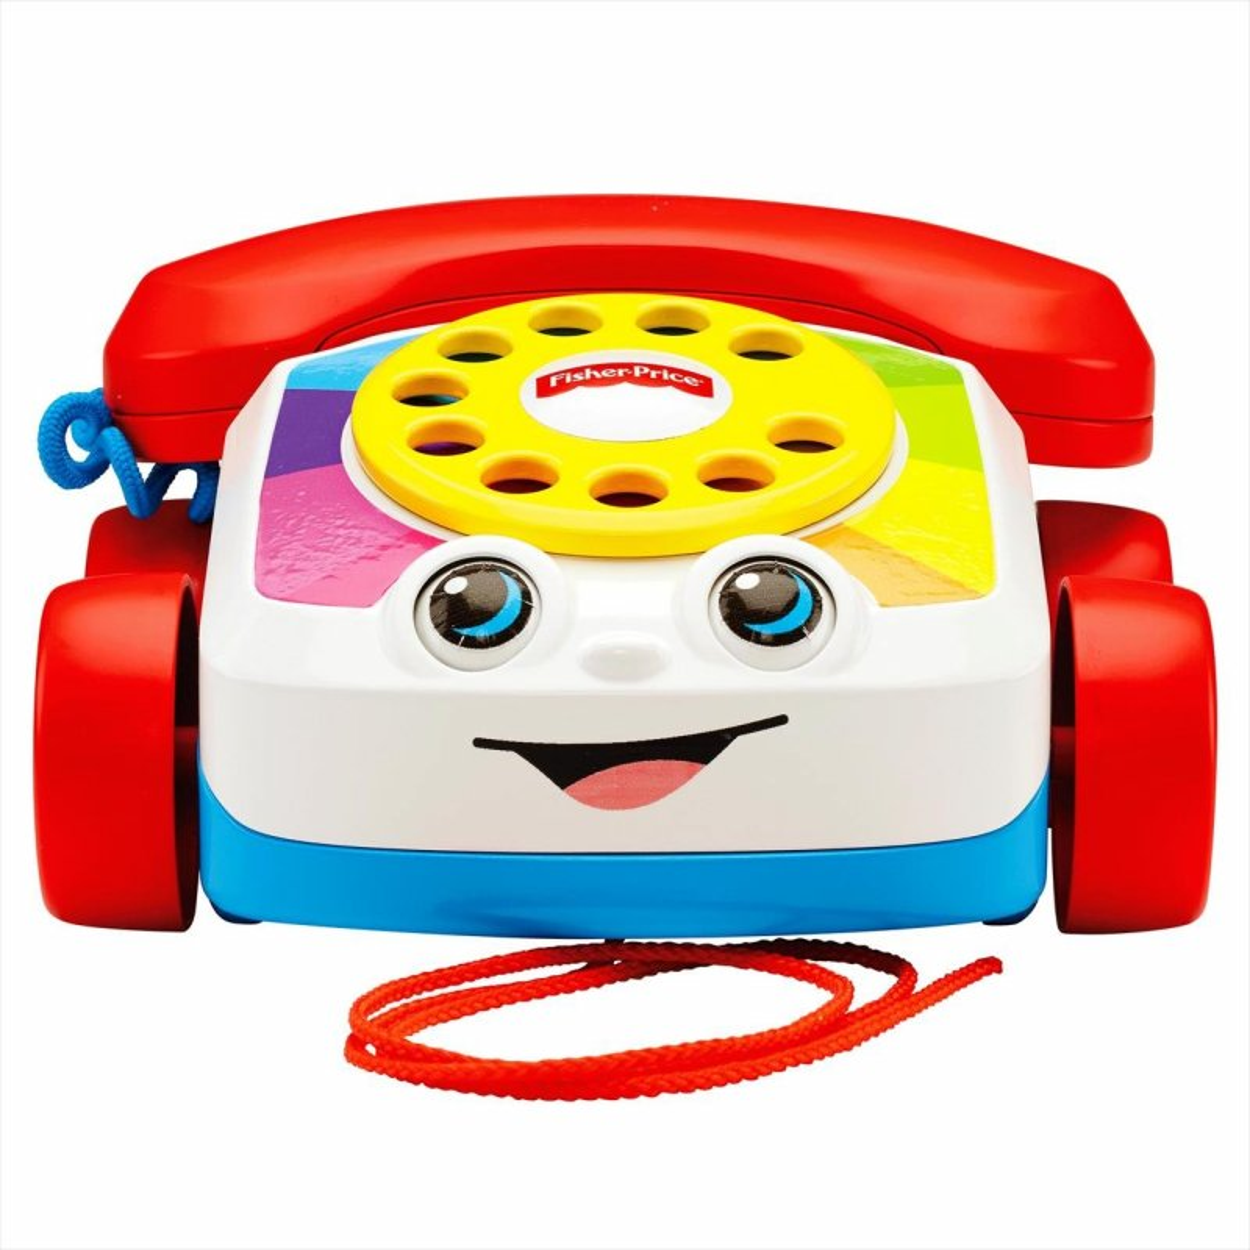 fisher price, fischer price, telefon, legetøjs telefon, legetøj til babyer